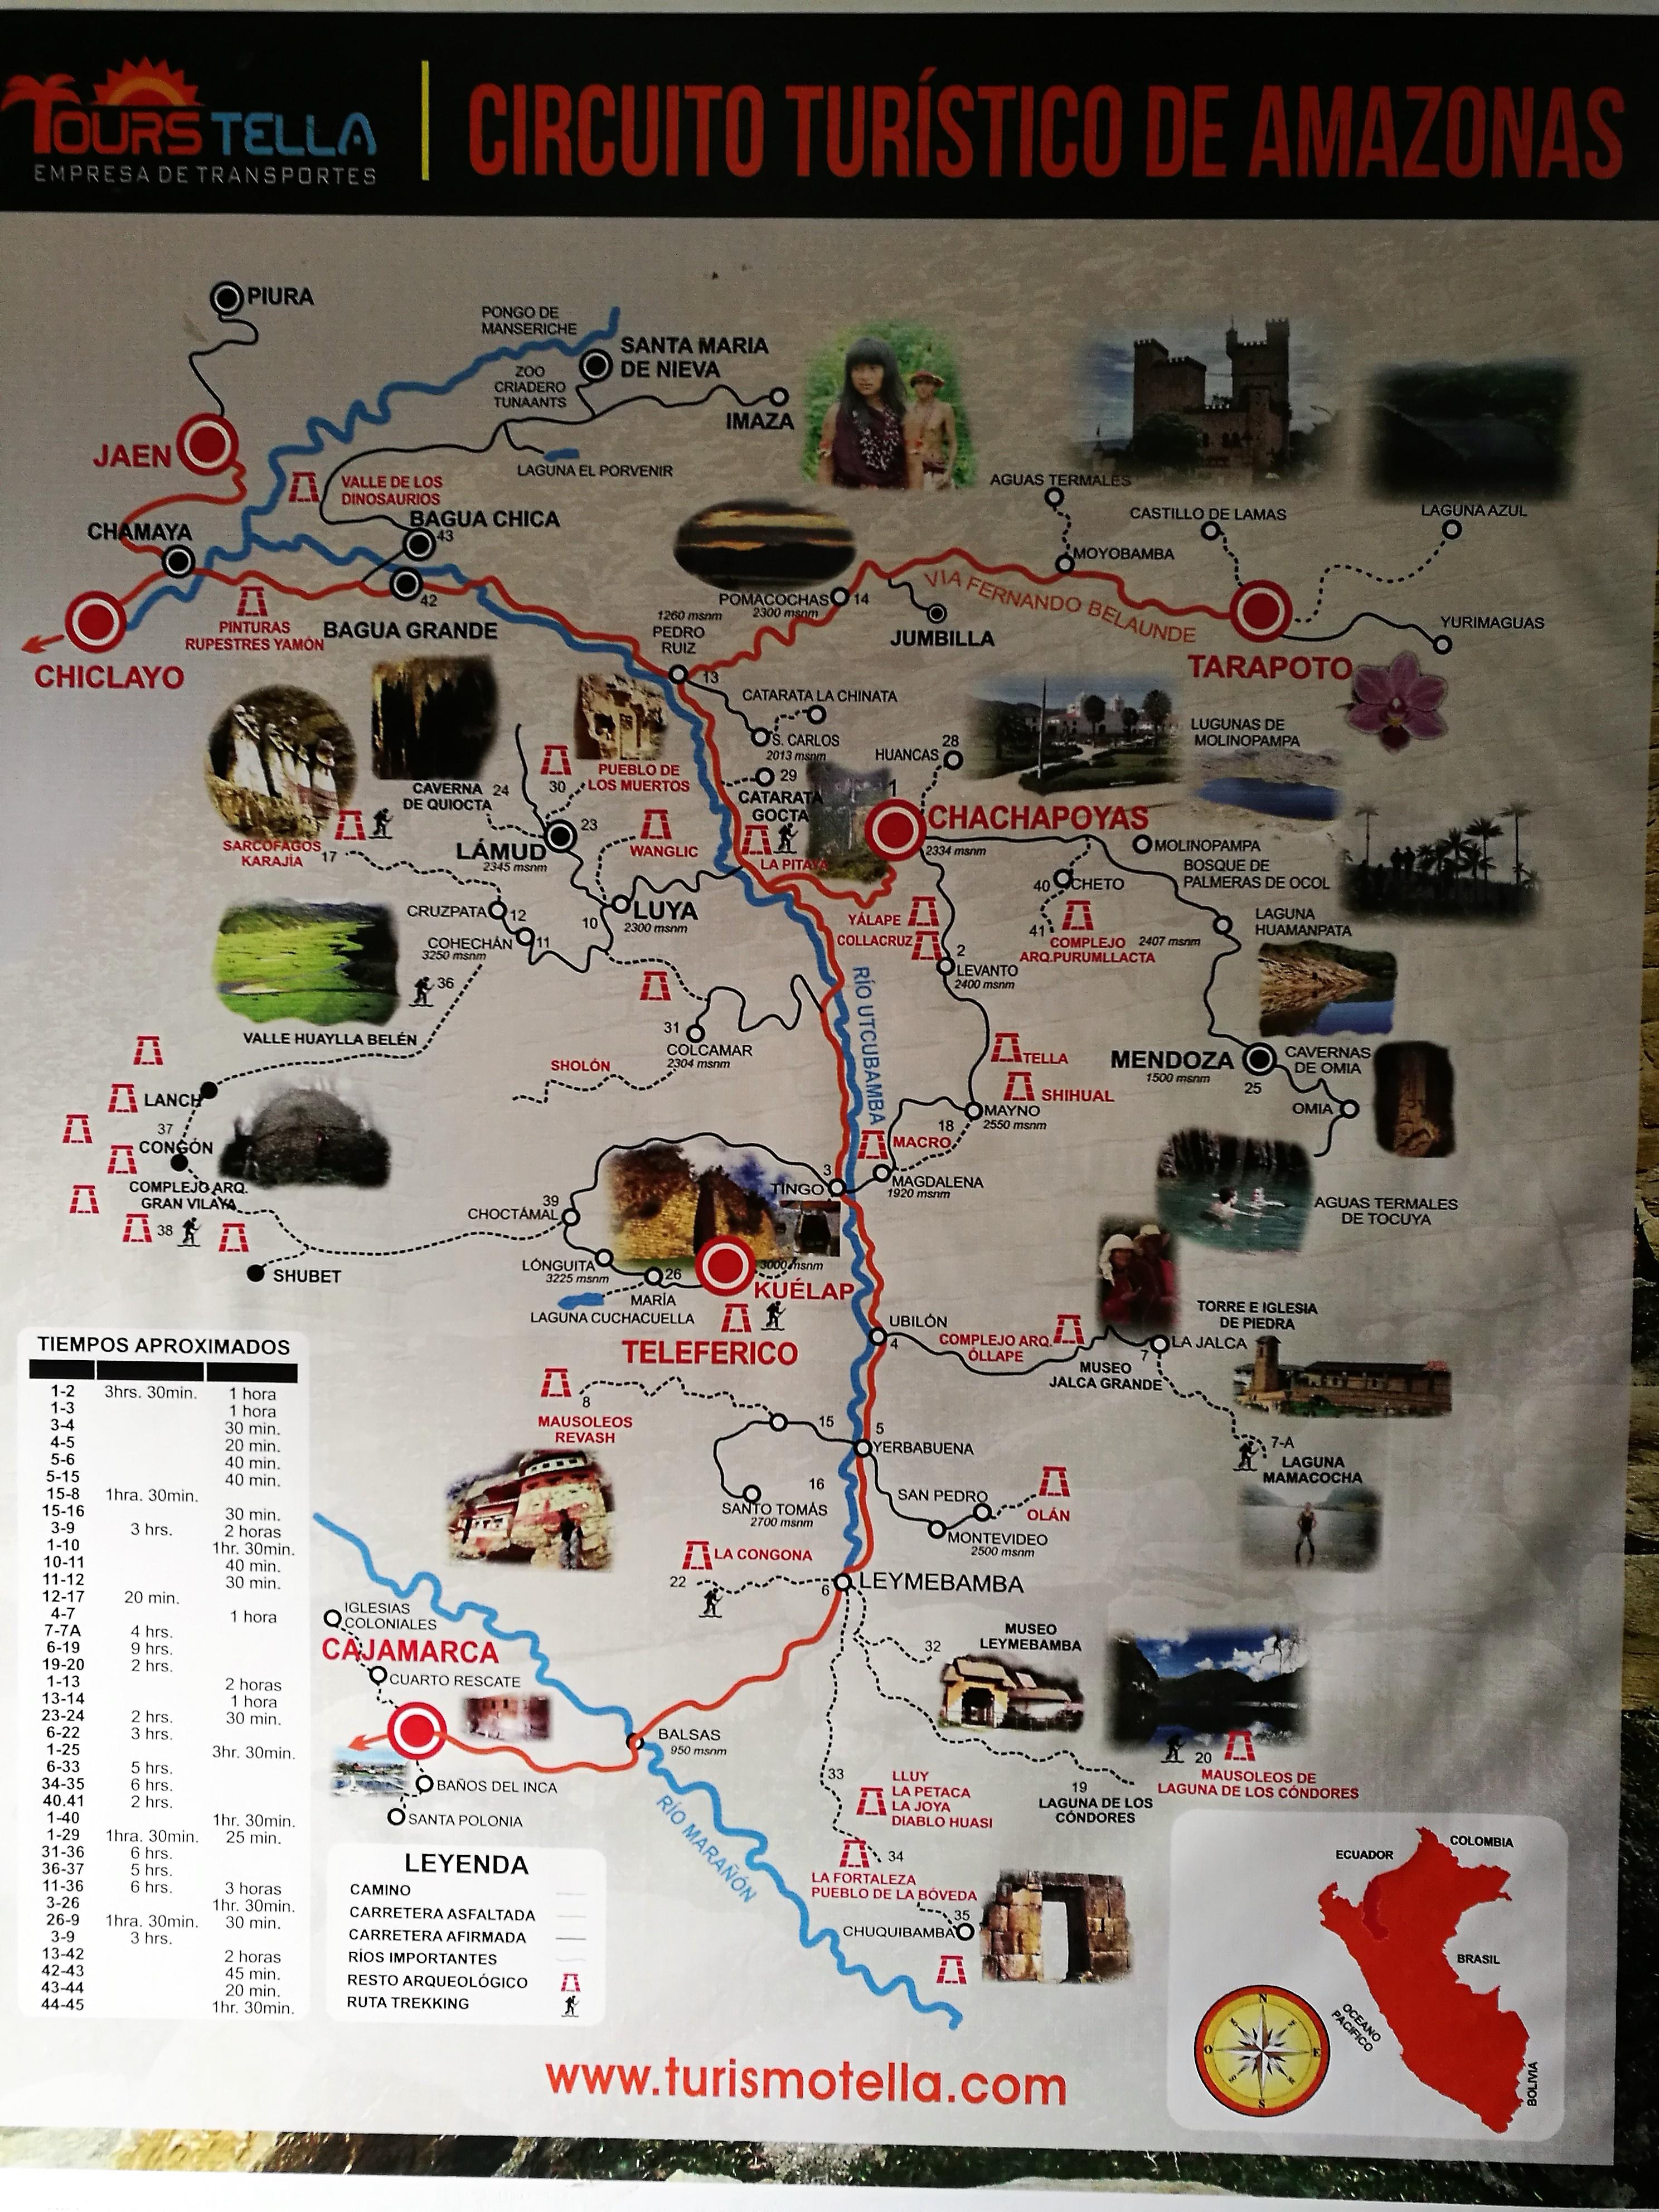 File Mapa Turistic De La Zona De Chachapoyas Jpg Wikimedia Commons